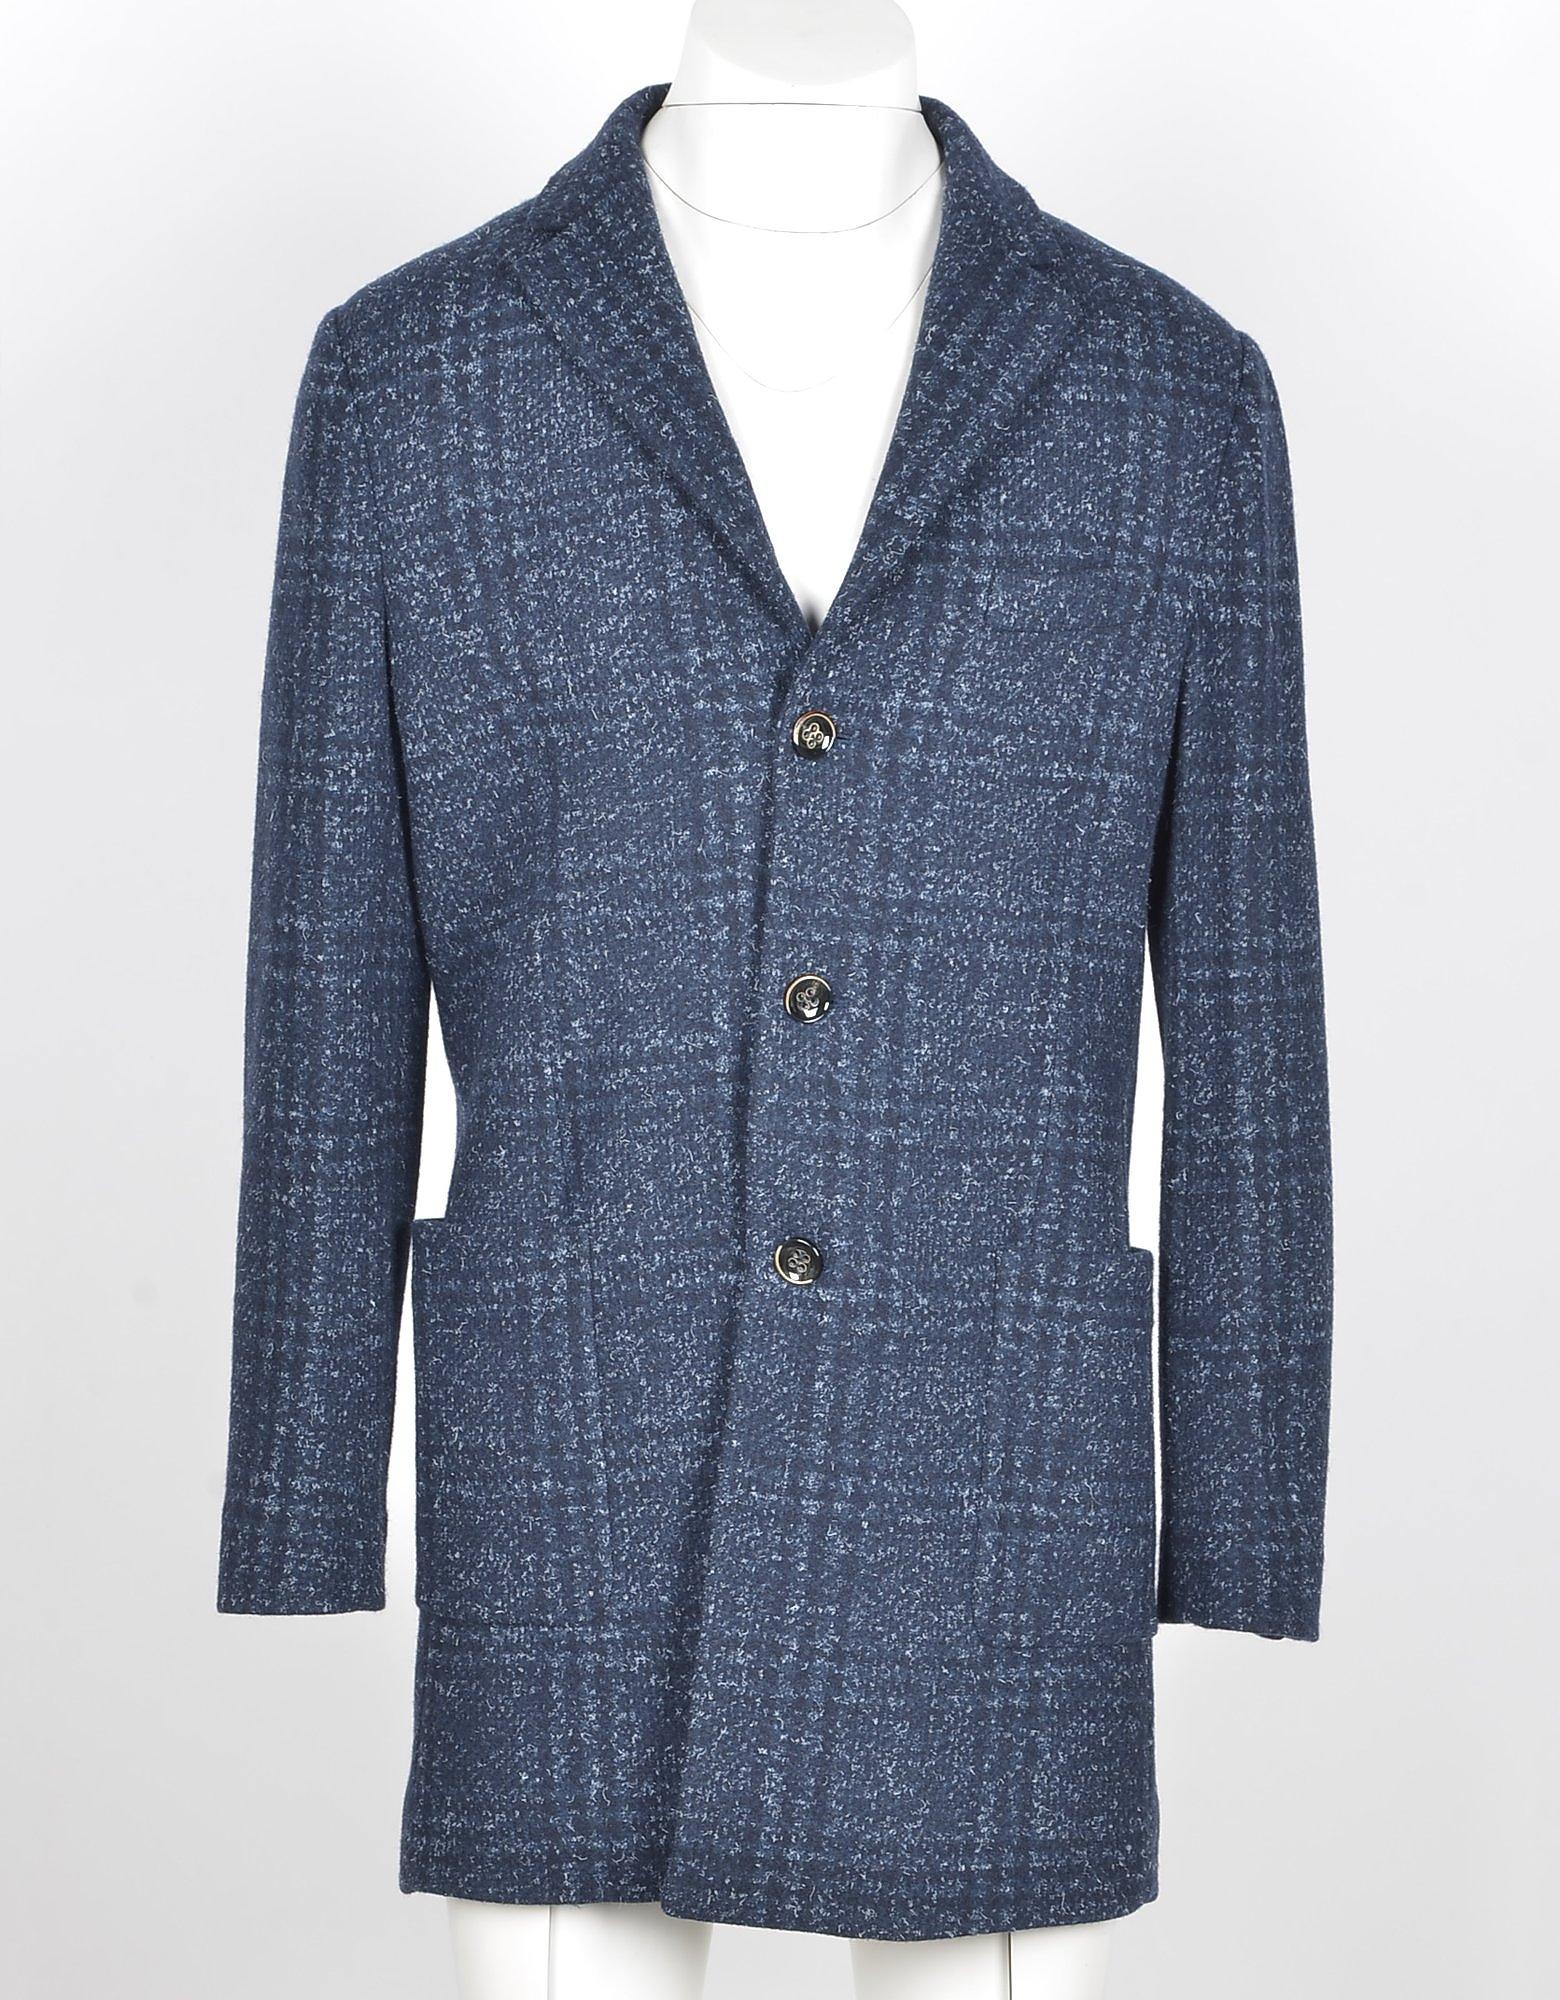 Paolo Pecora Designer Coats & Jackets, Men's Blue Coat